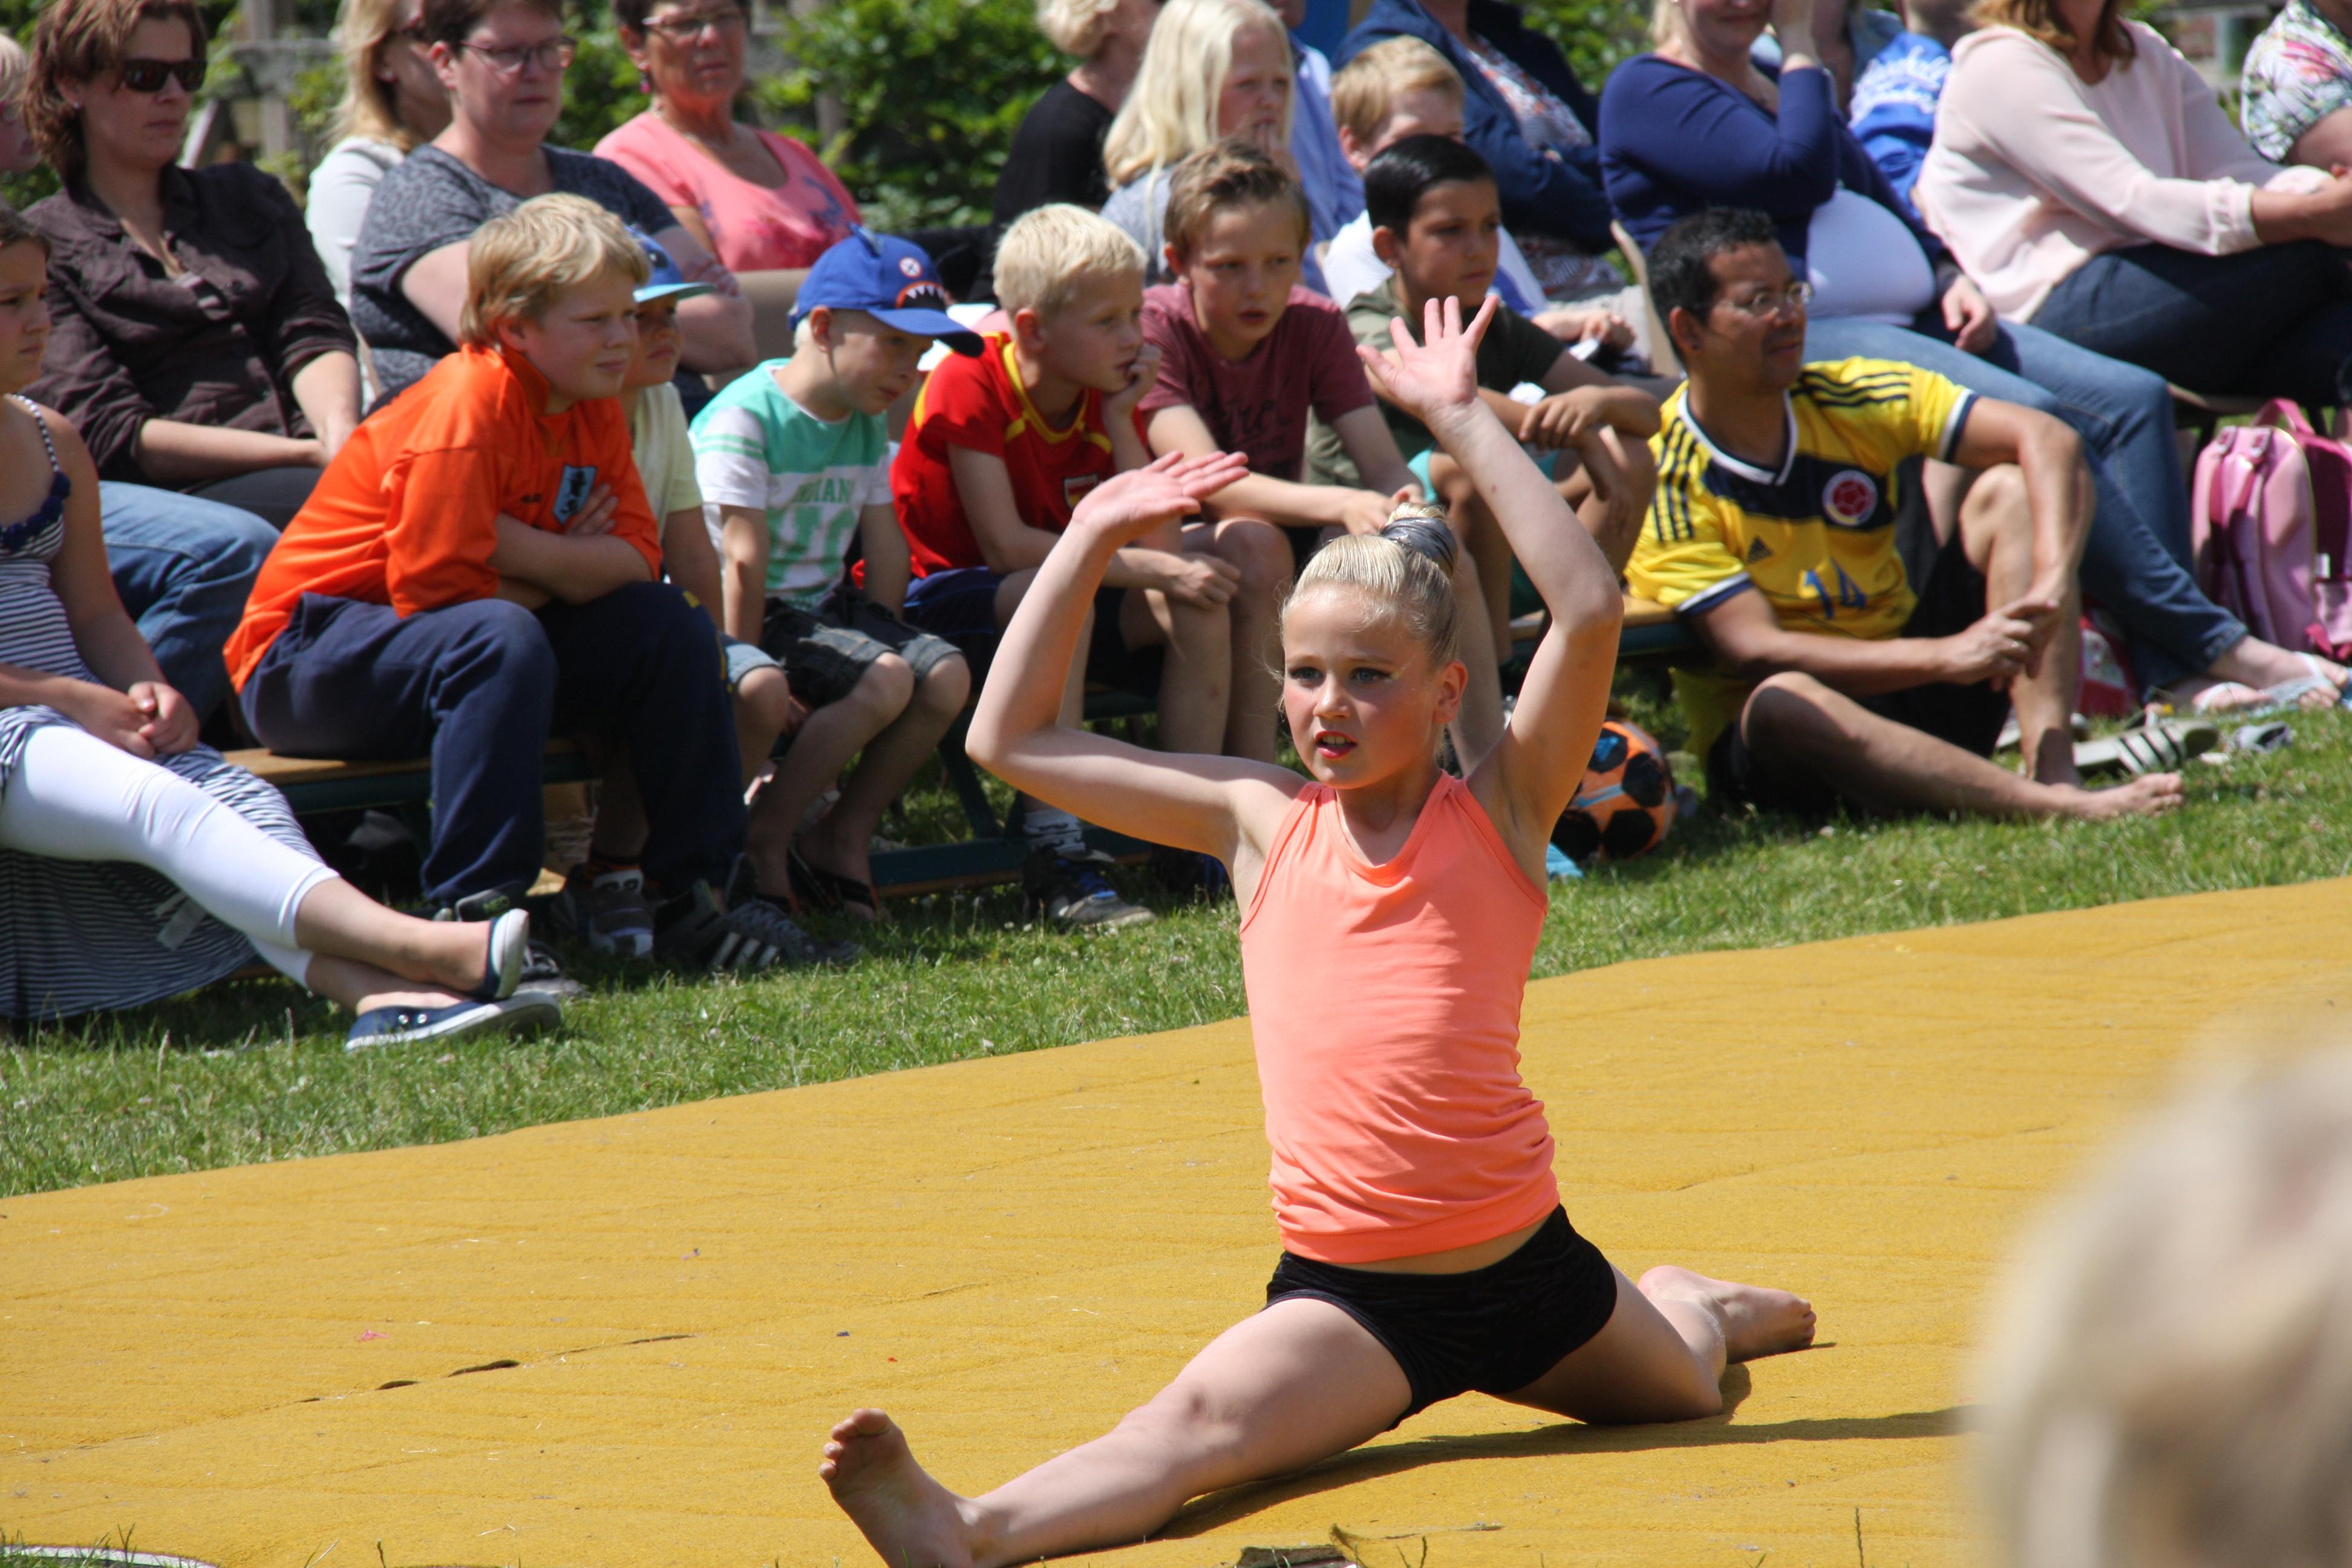 gymnastiekuitvoering-juni-2015-021